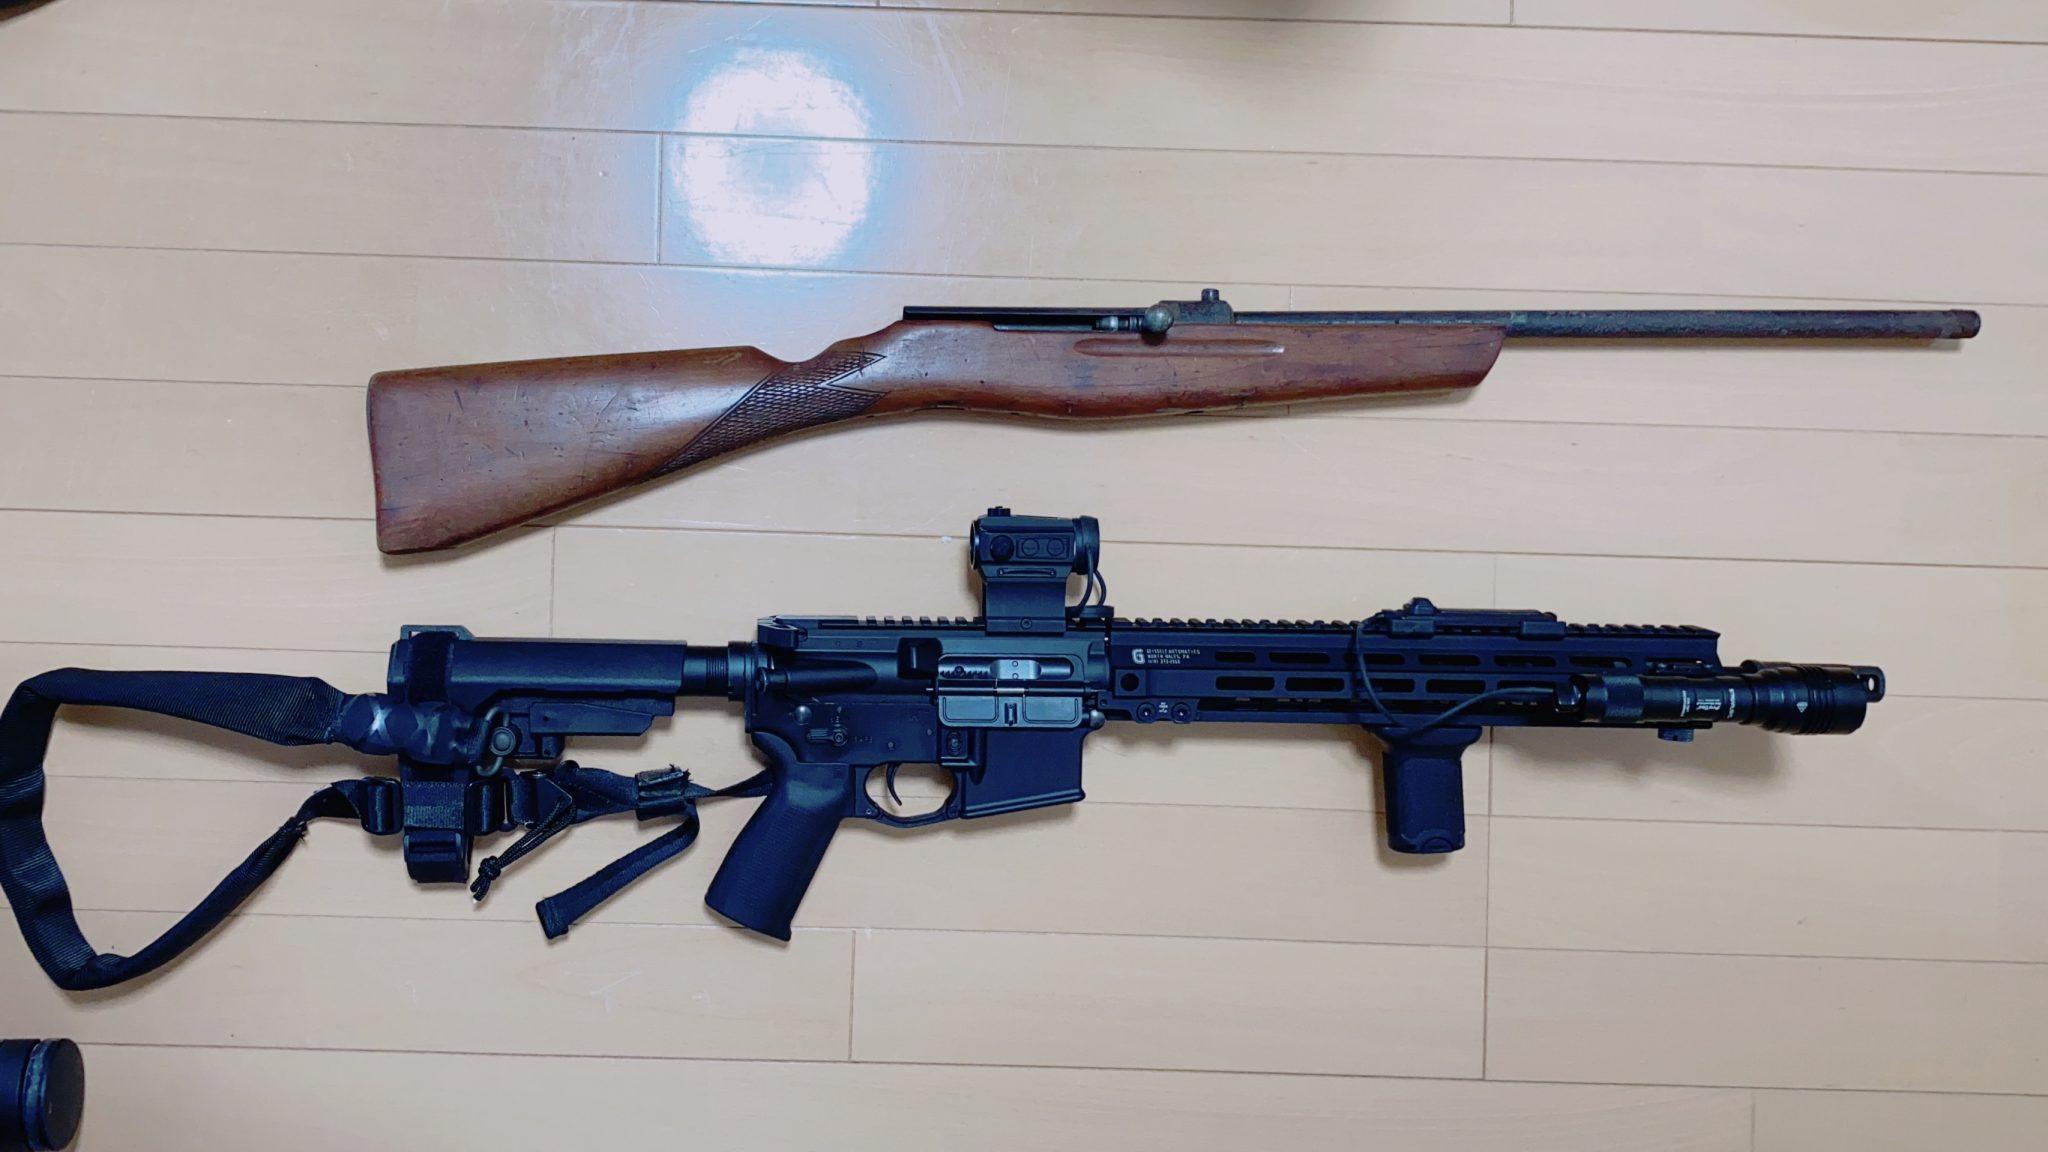 8D1B47E3 1D53 447D 9347 9257F841F88C - 射的銃(コルク)のレストアpart1